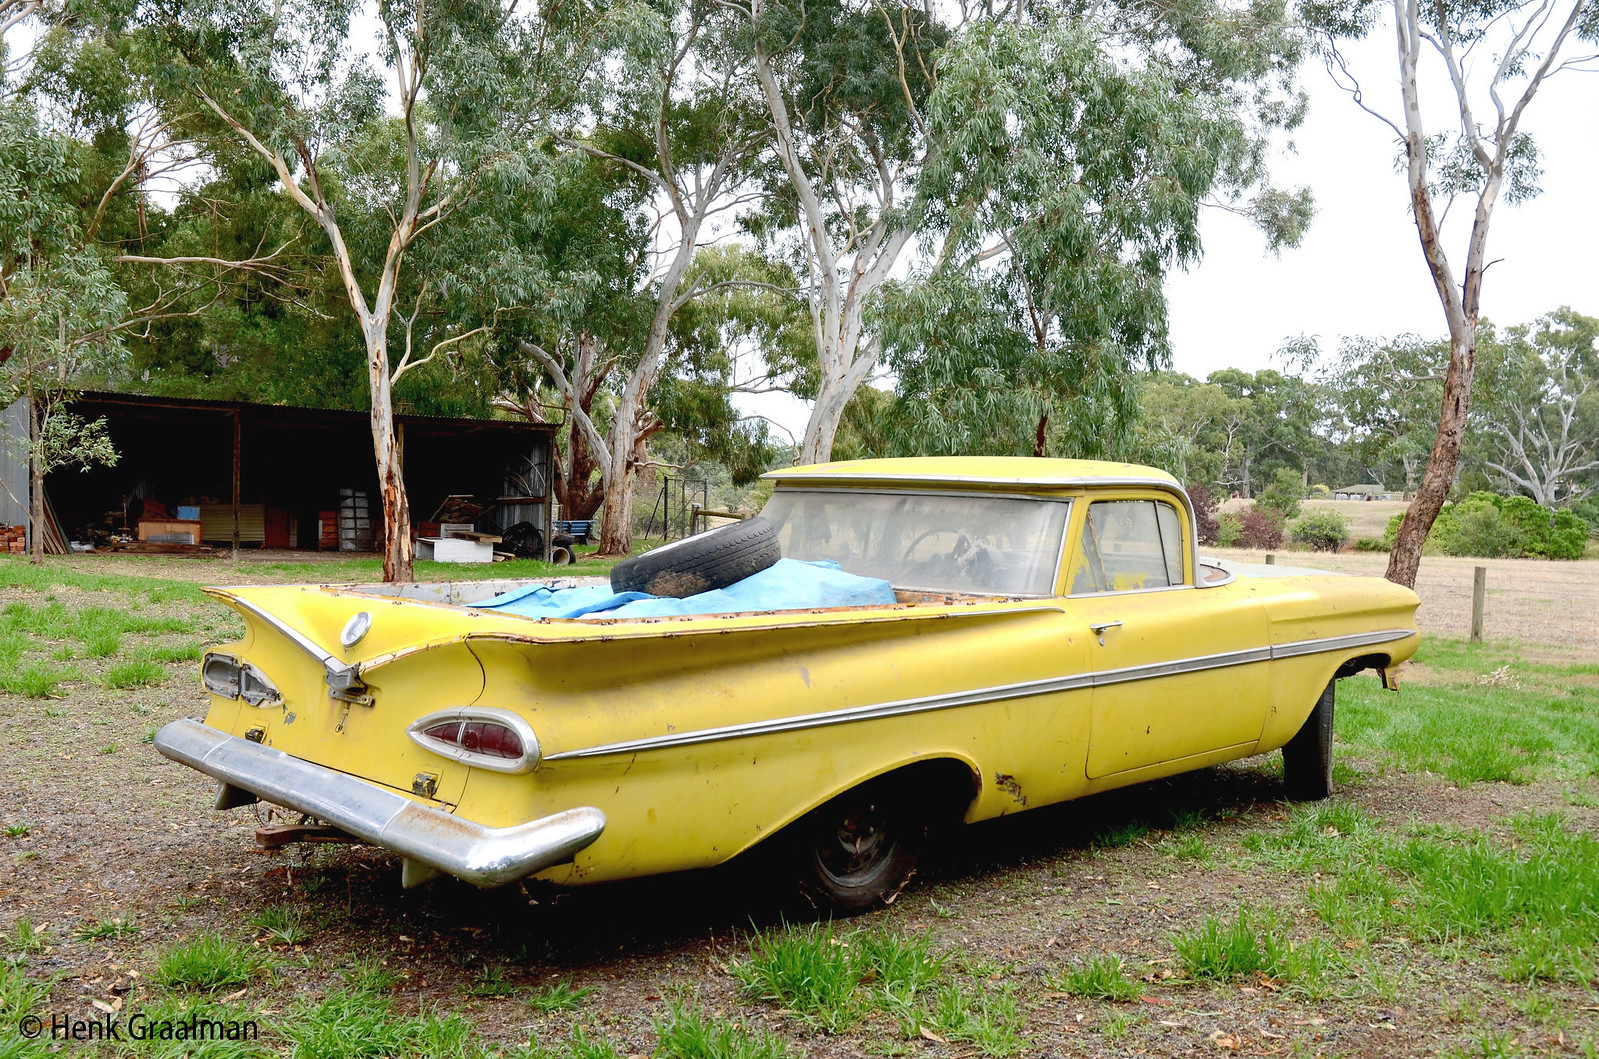 Australian outback old timer car wrecks and farm junkyards | Flickr